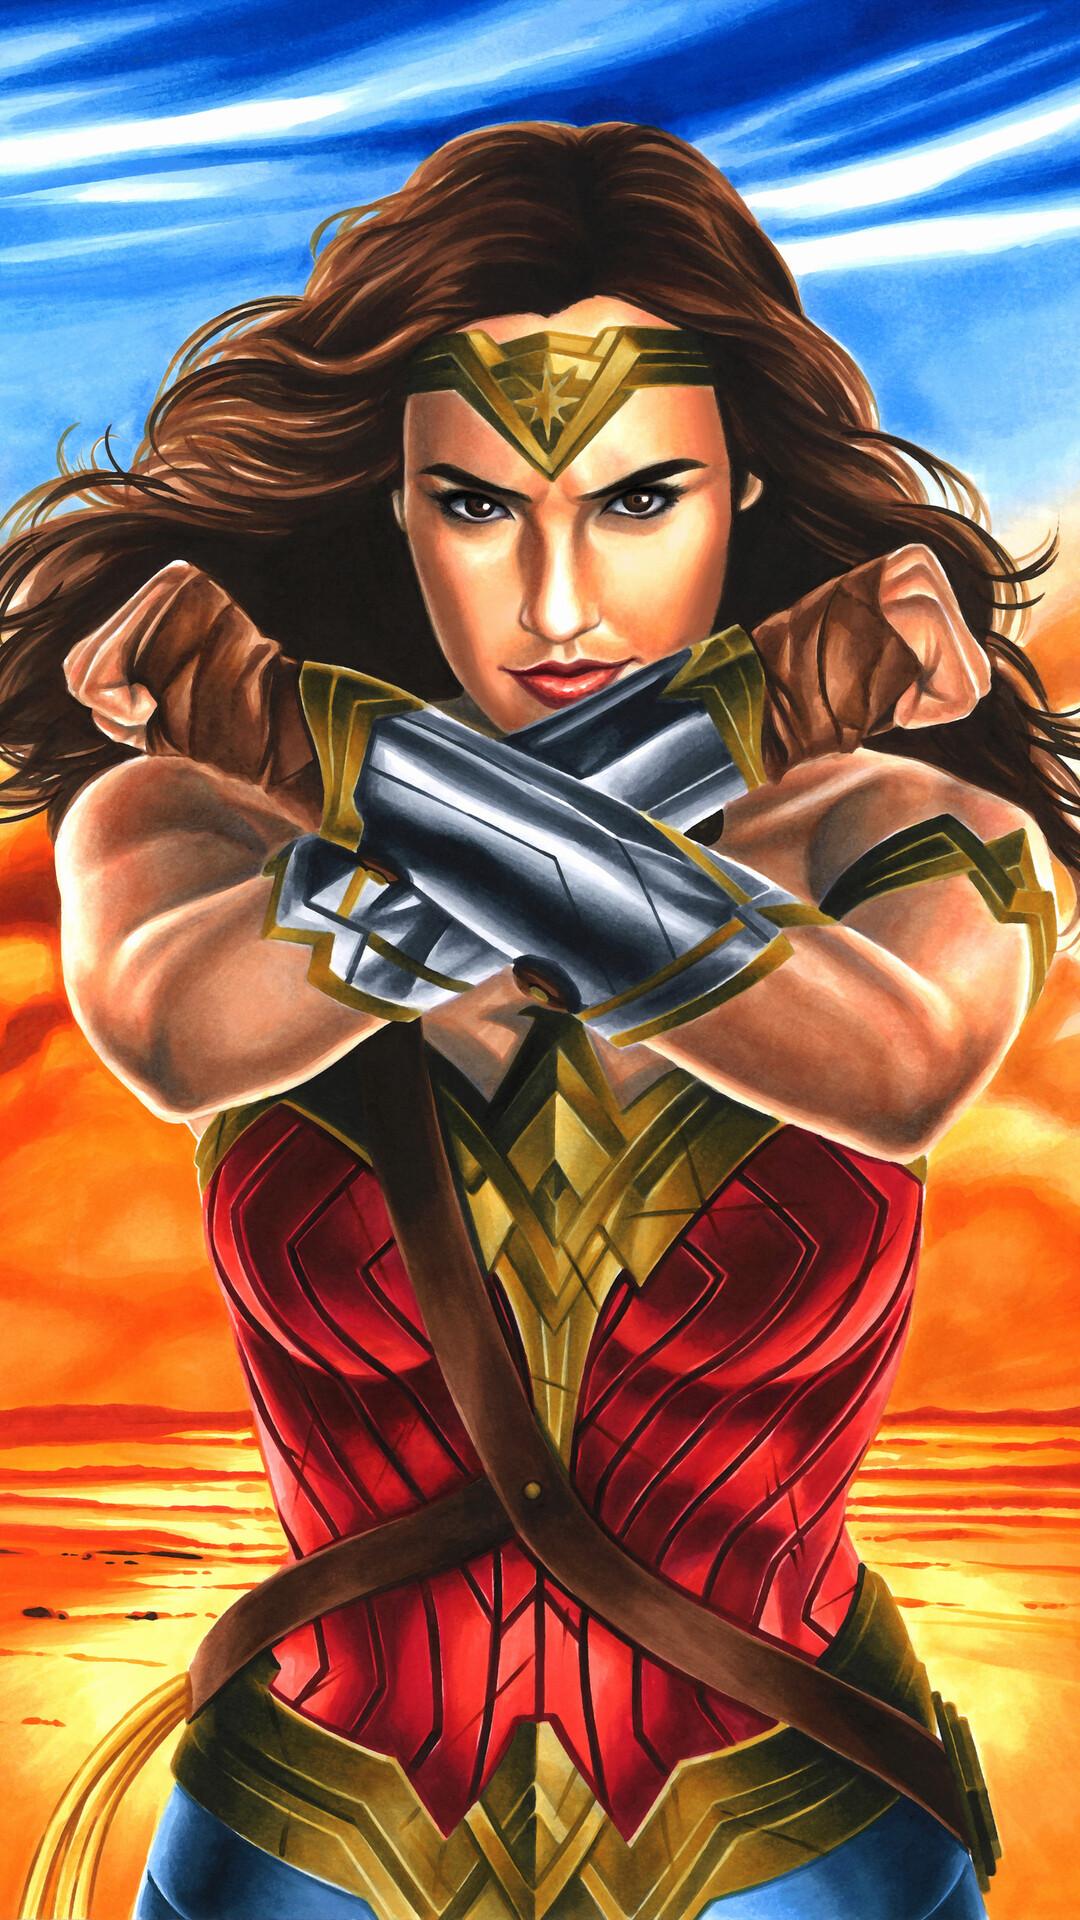 Wonder Woman Fanart 2017 Pq